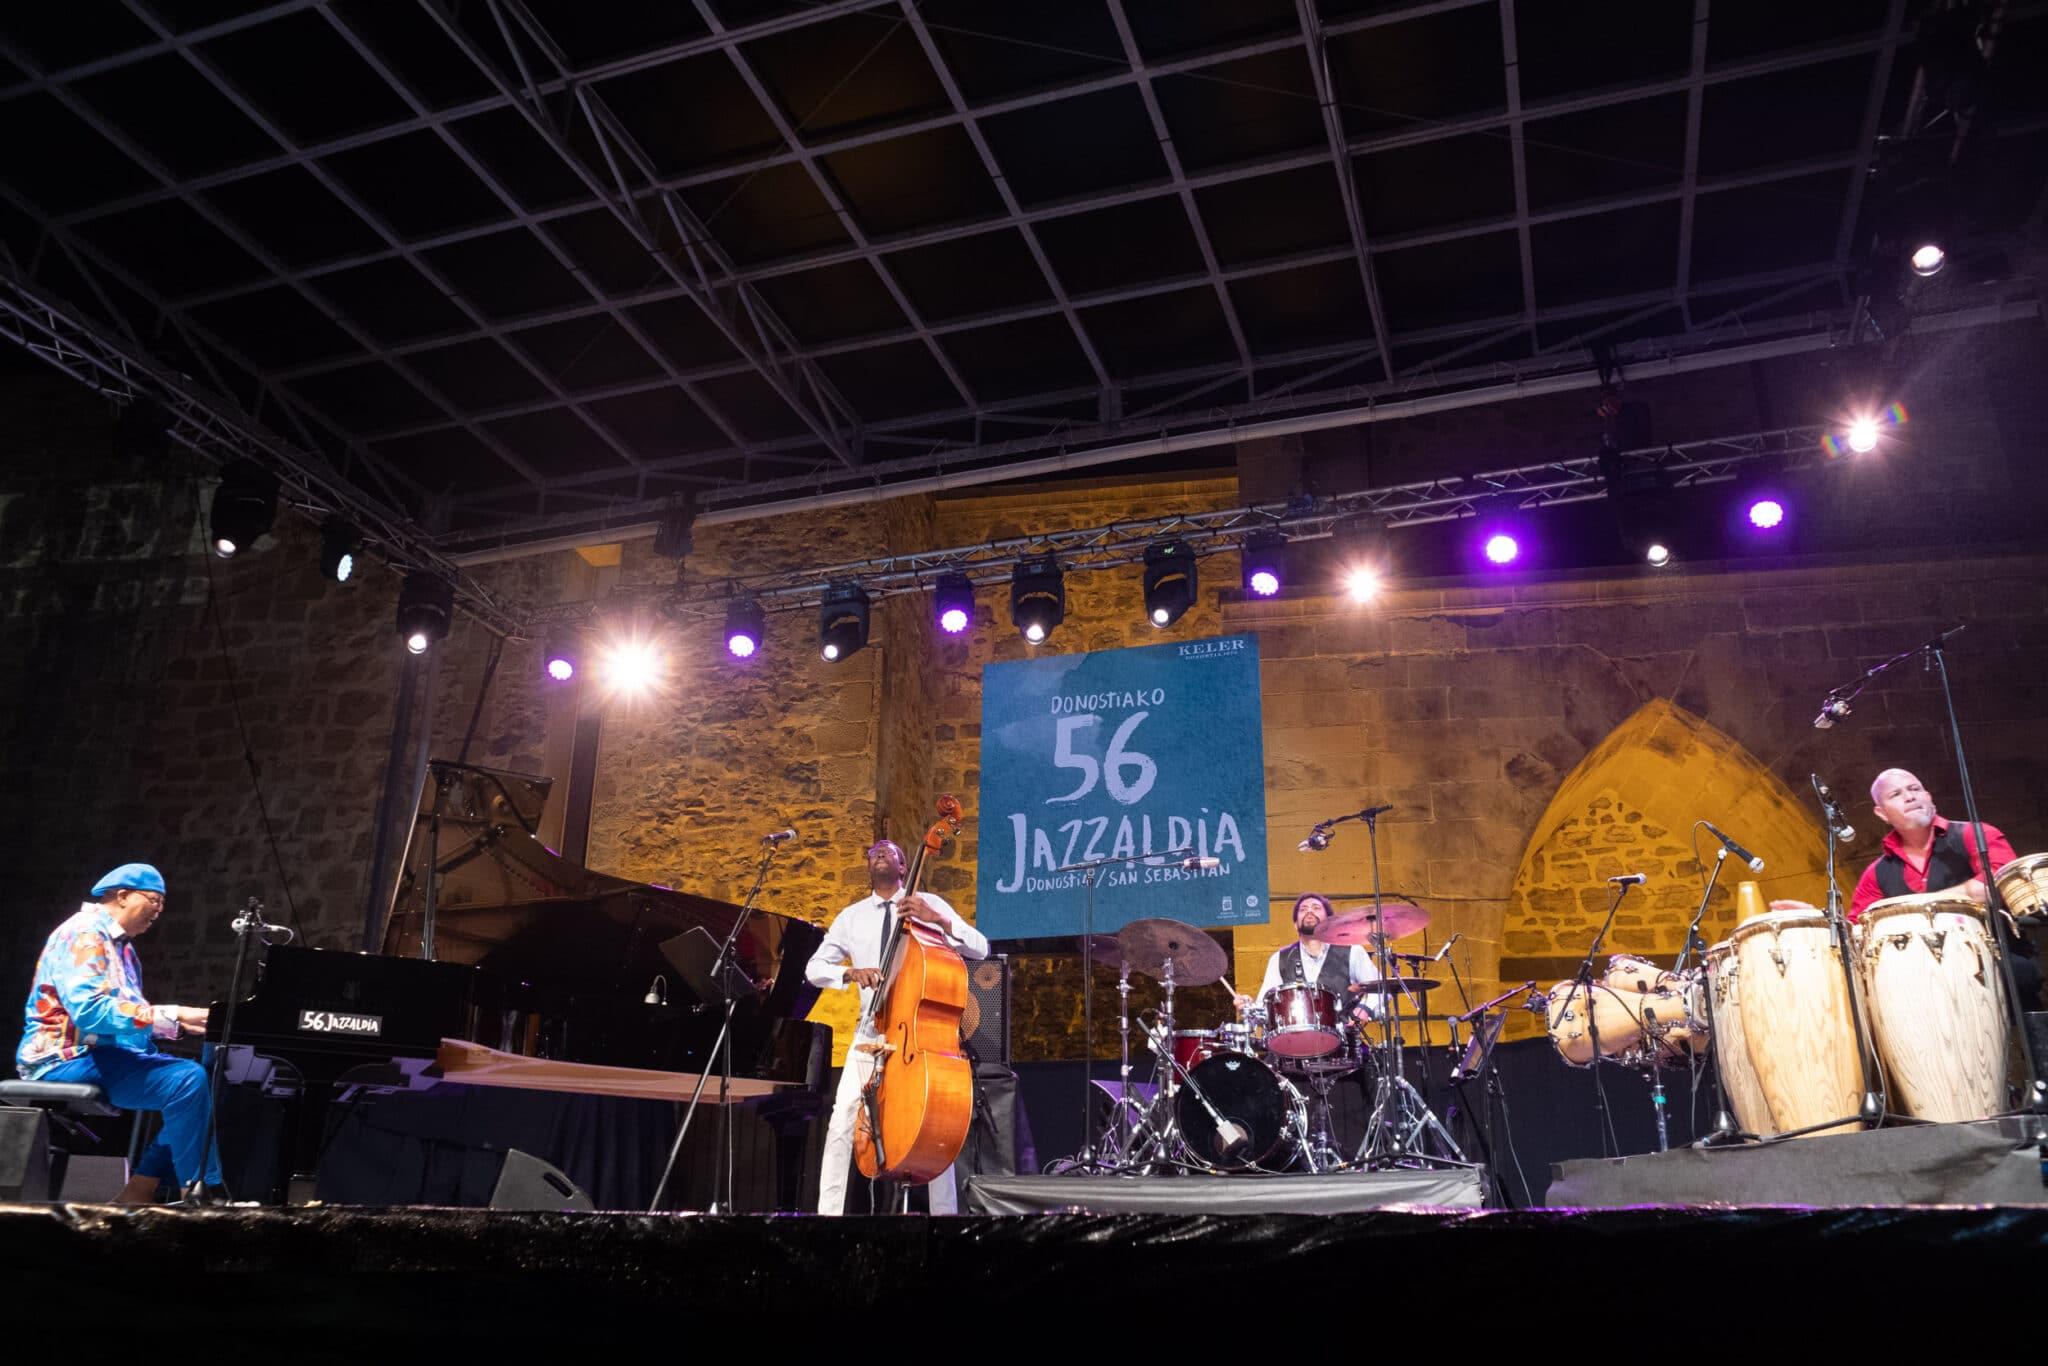 DSCF2265 scaled - Chucho Valdés recoge su premio Donostiako Jazzaldia